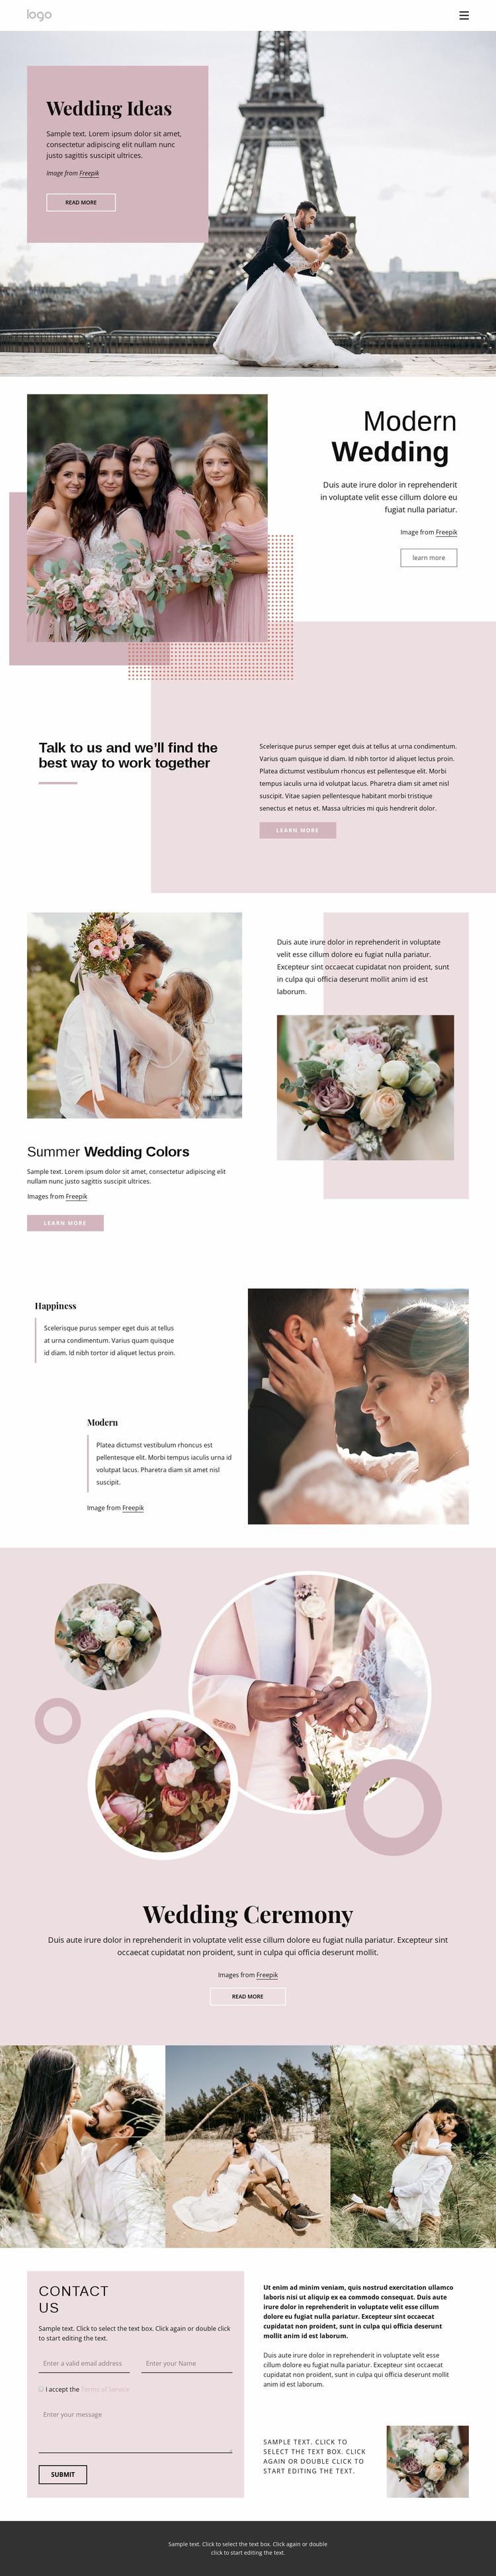 Unique wedding ceremony Html Website Builder